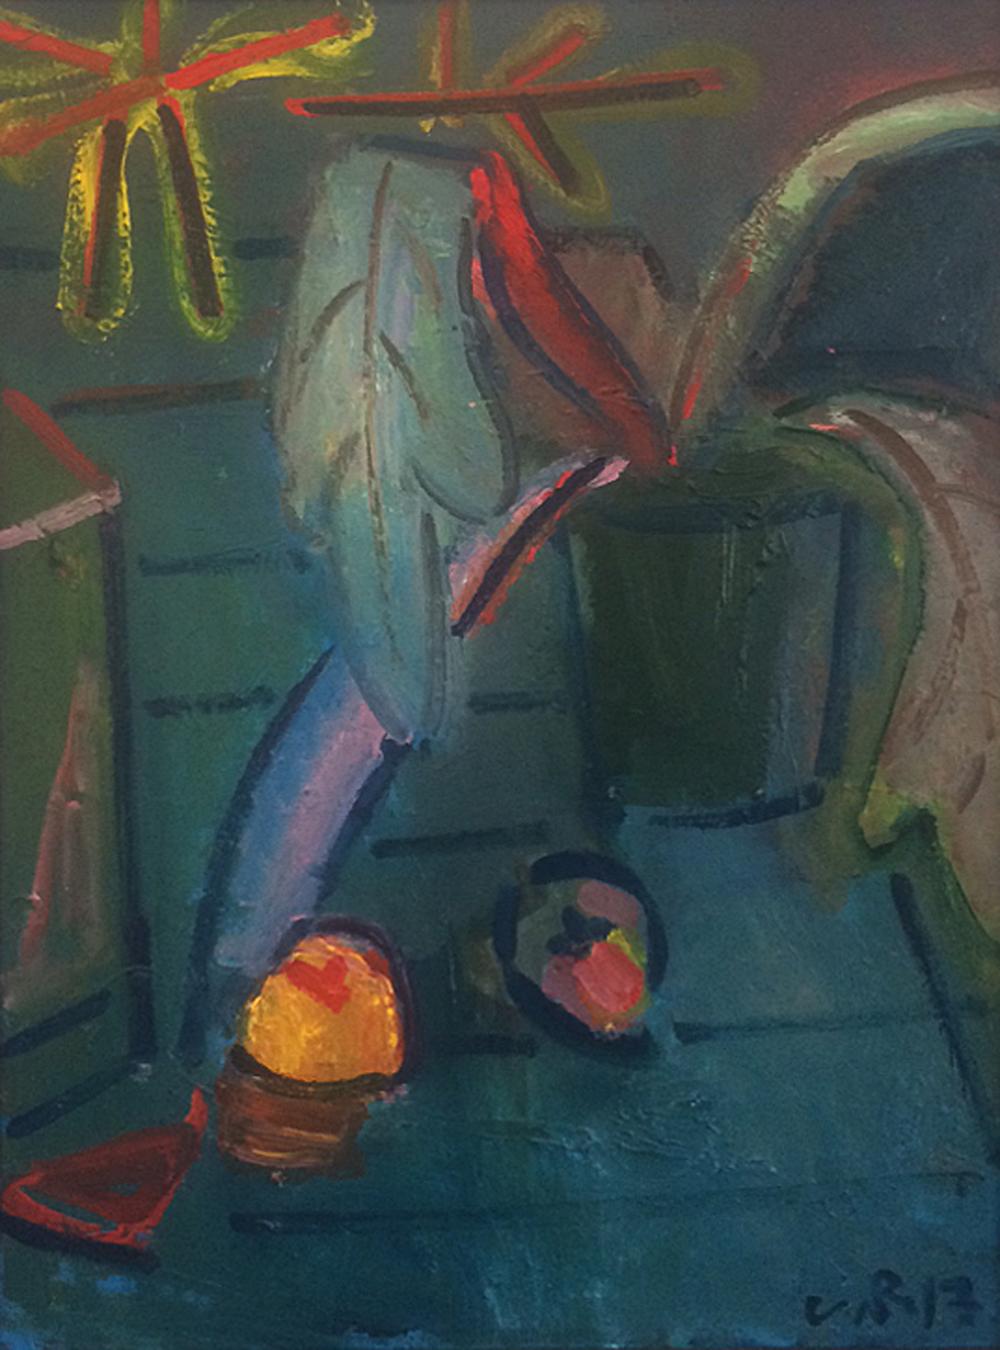 Artist: Luke Hannam  Title: Blue Garden Table  Size: 101 x 75 cm  Medium: Oil on canvas  Price: £1900